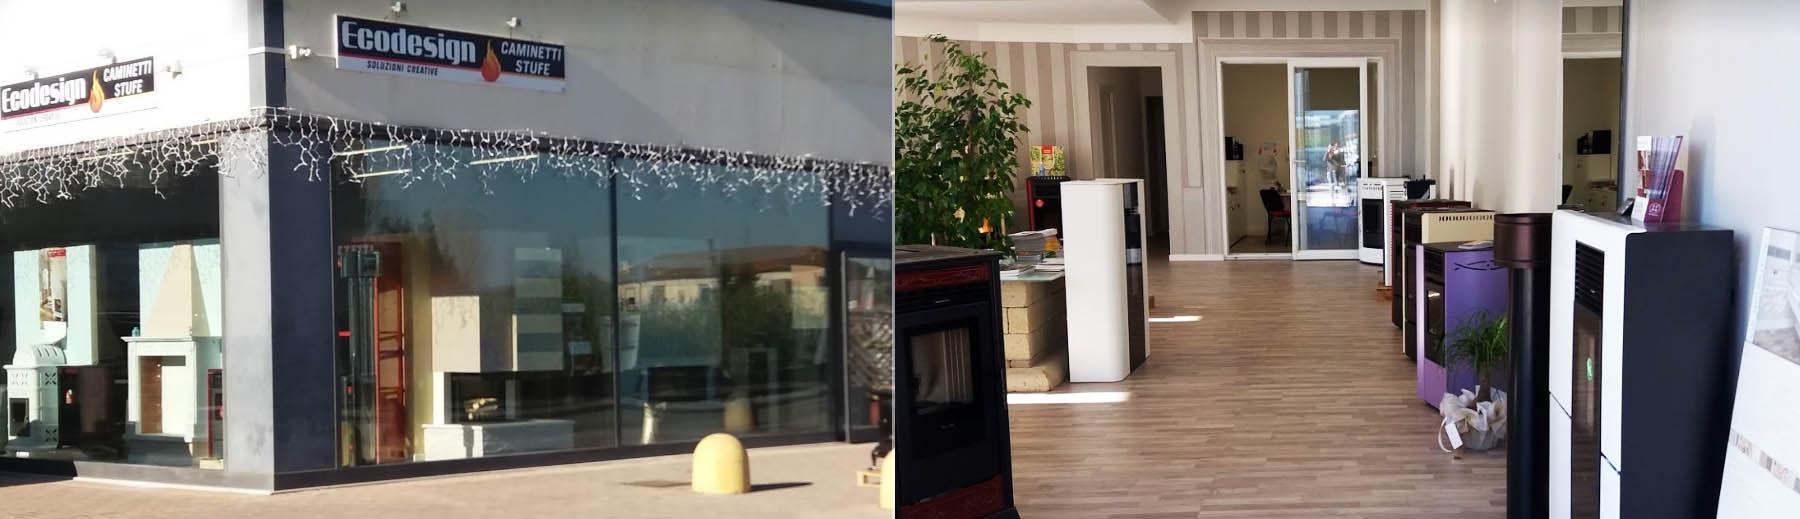 Ecodesogn esterno ed interno a Pontedera